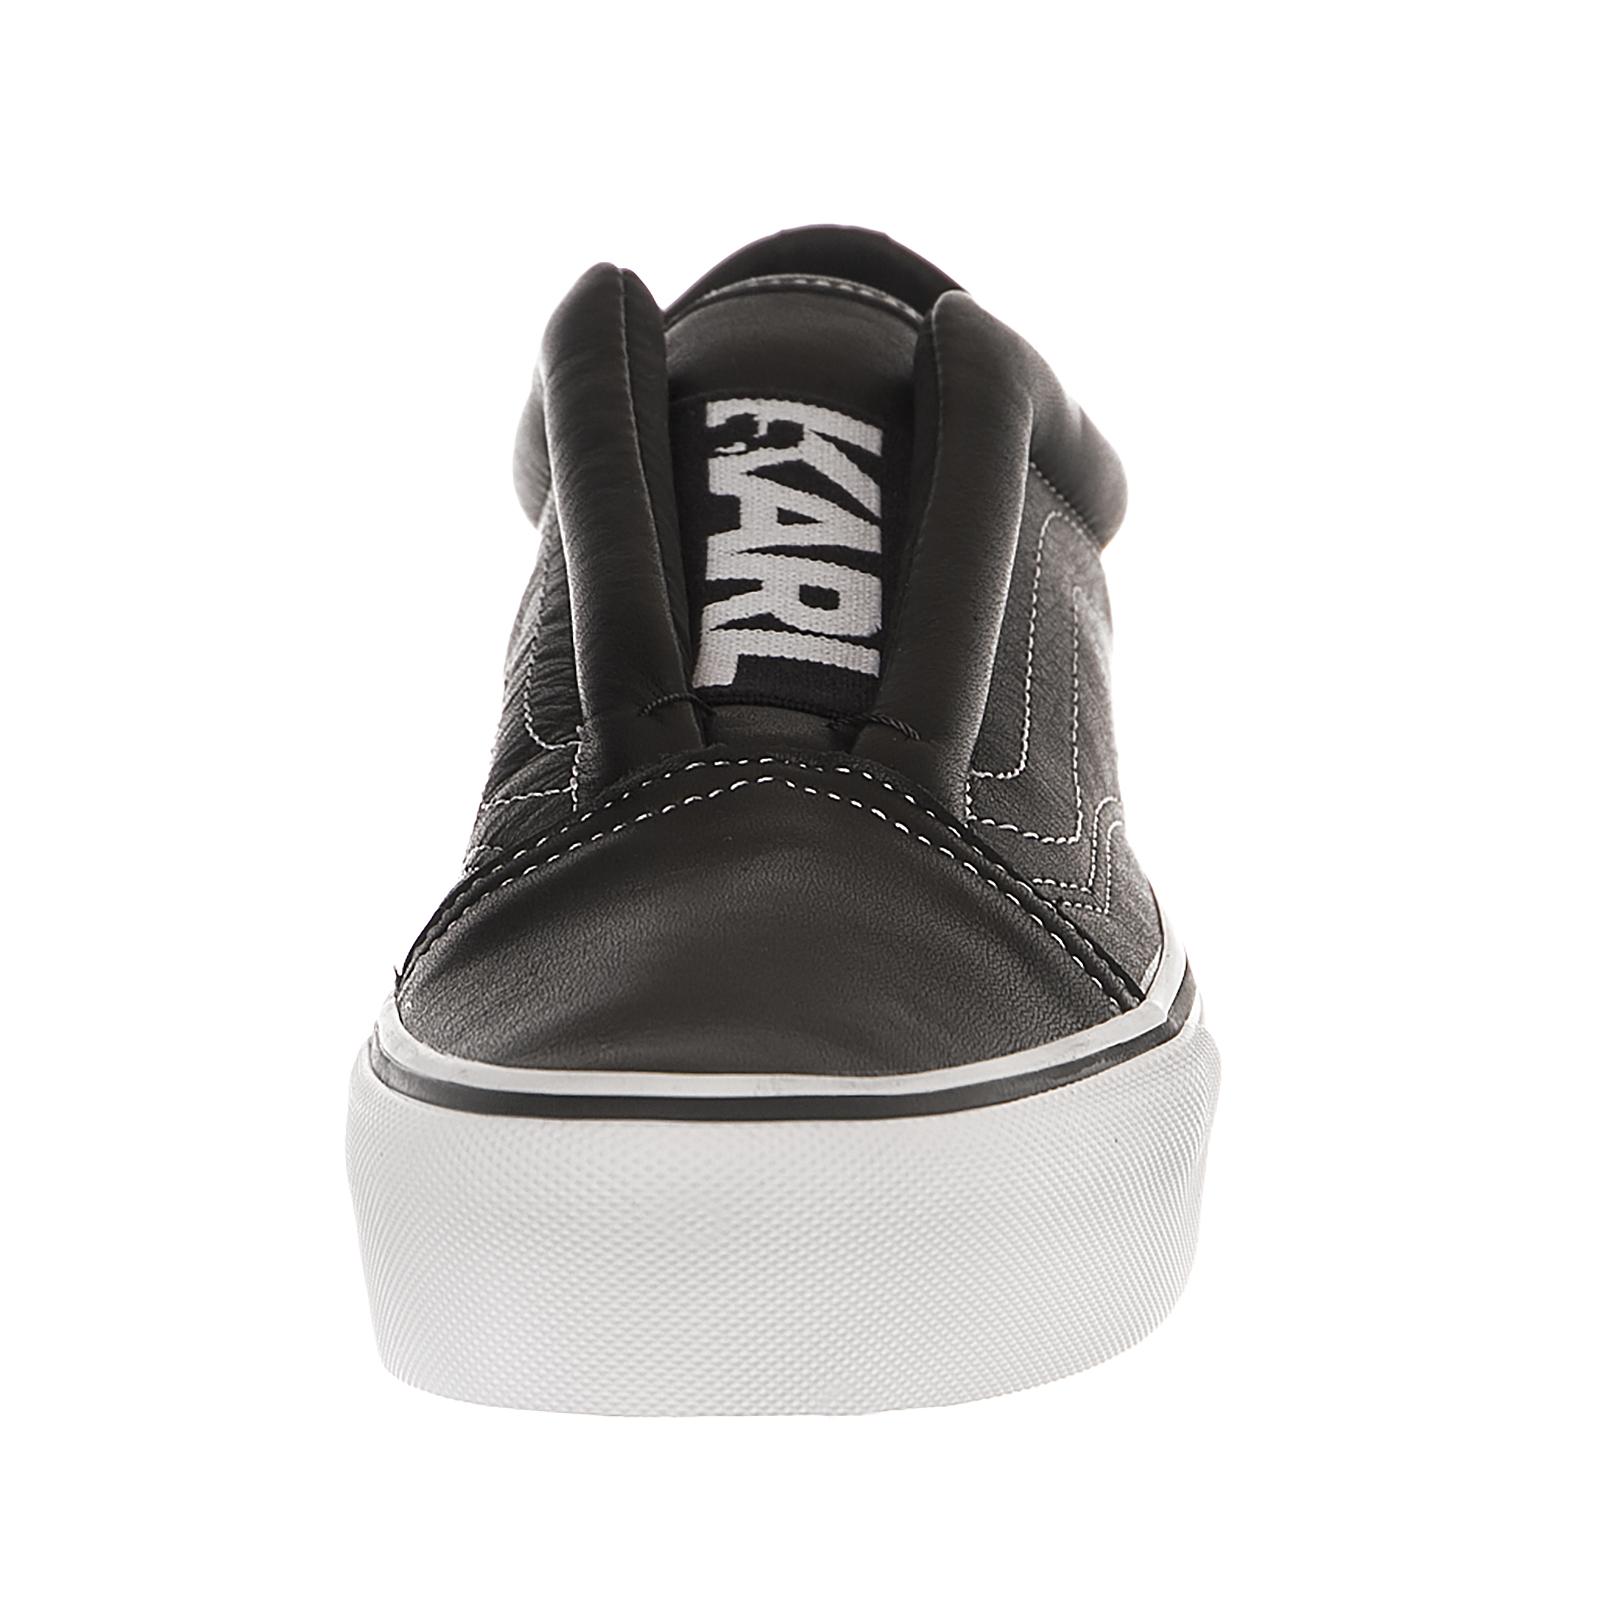 ac0775434f VANS (karl Lagerfeld) Old Skool Laceless Platform Leather Black Sz 9 ...